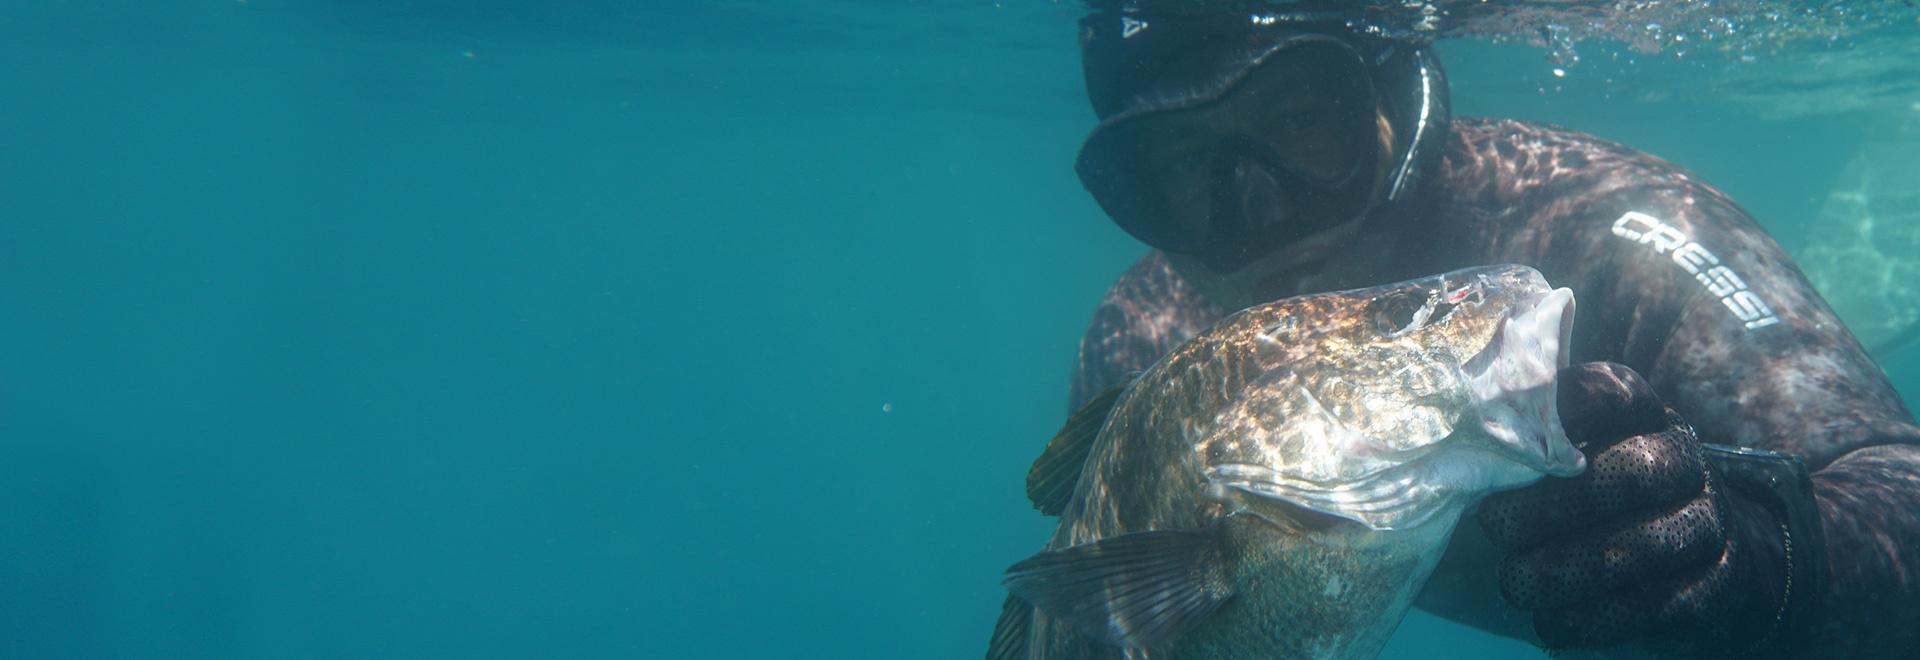 Parliamo di pesca in apnea